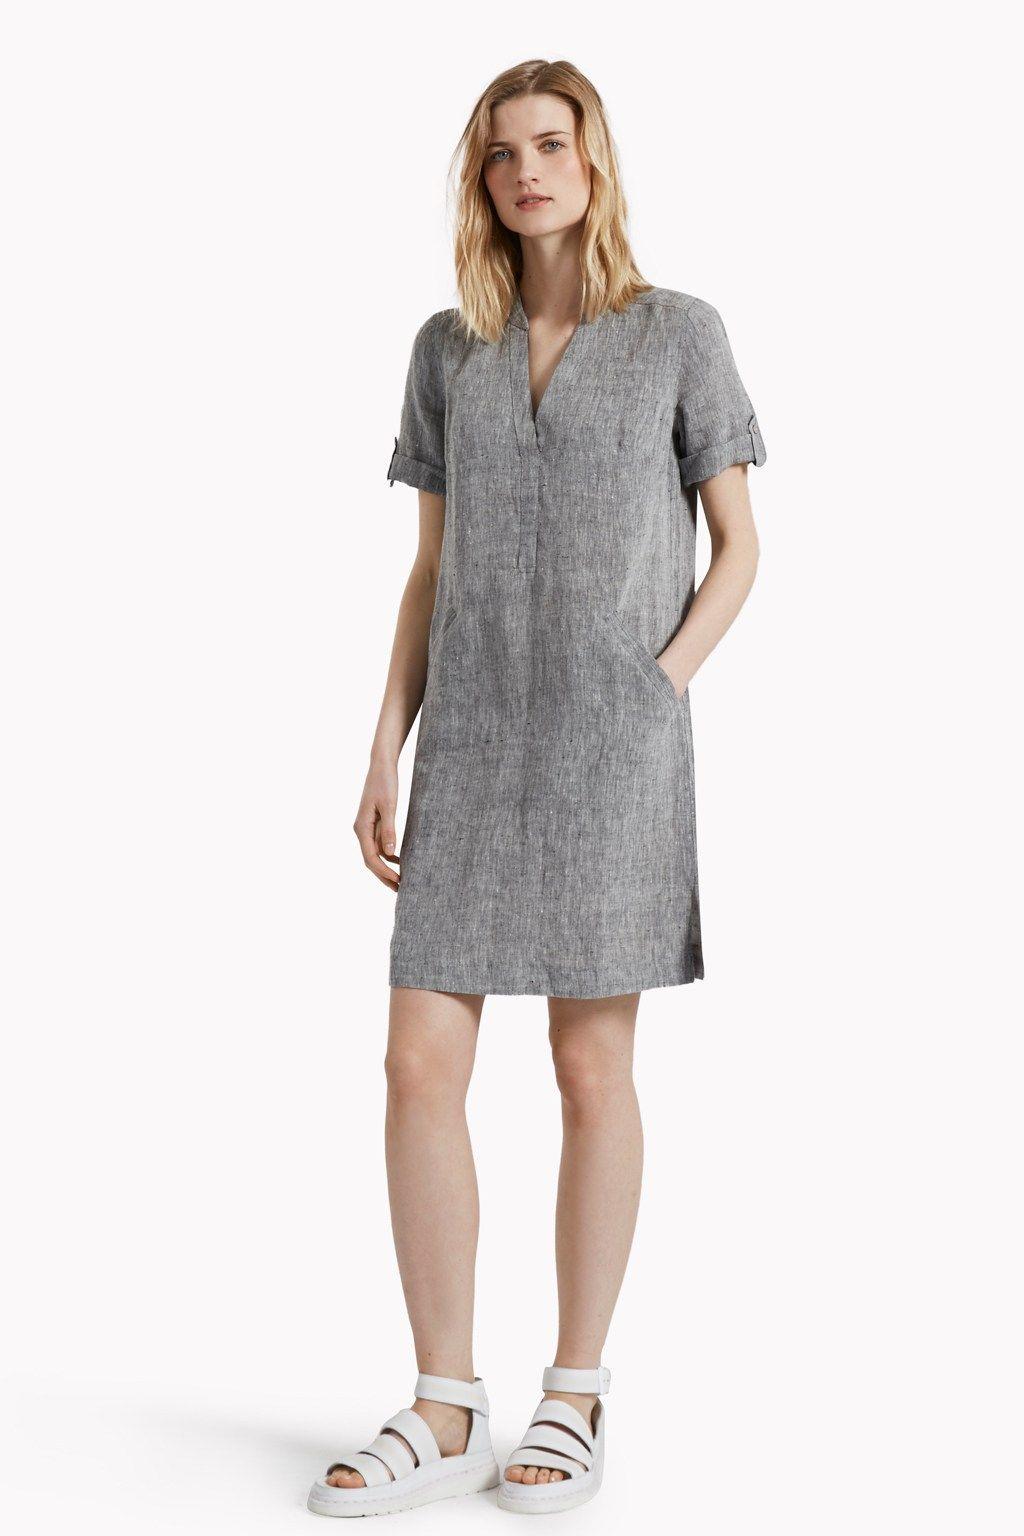 395166cd509744 Layla Linen Melange Smock Dress   Bestsellers   Great Plains   Great ...